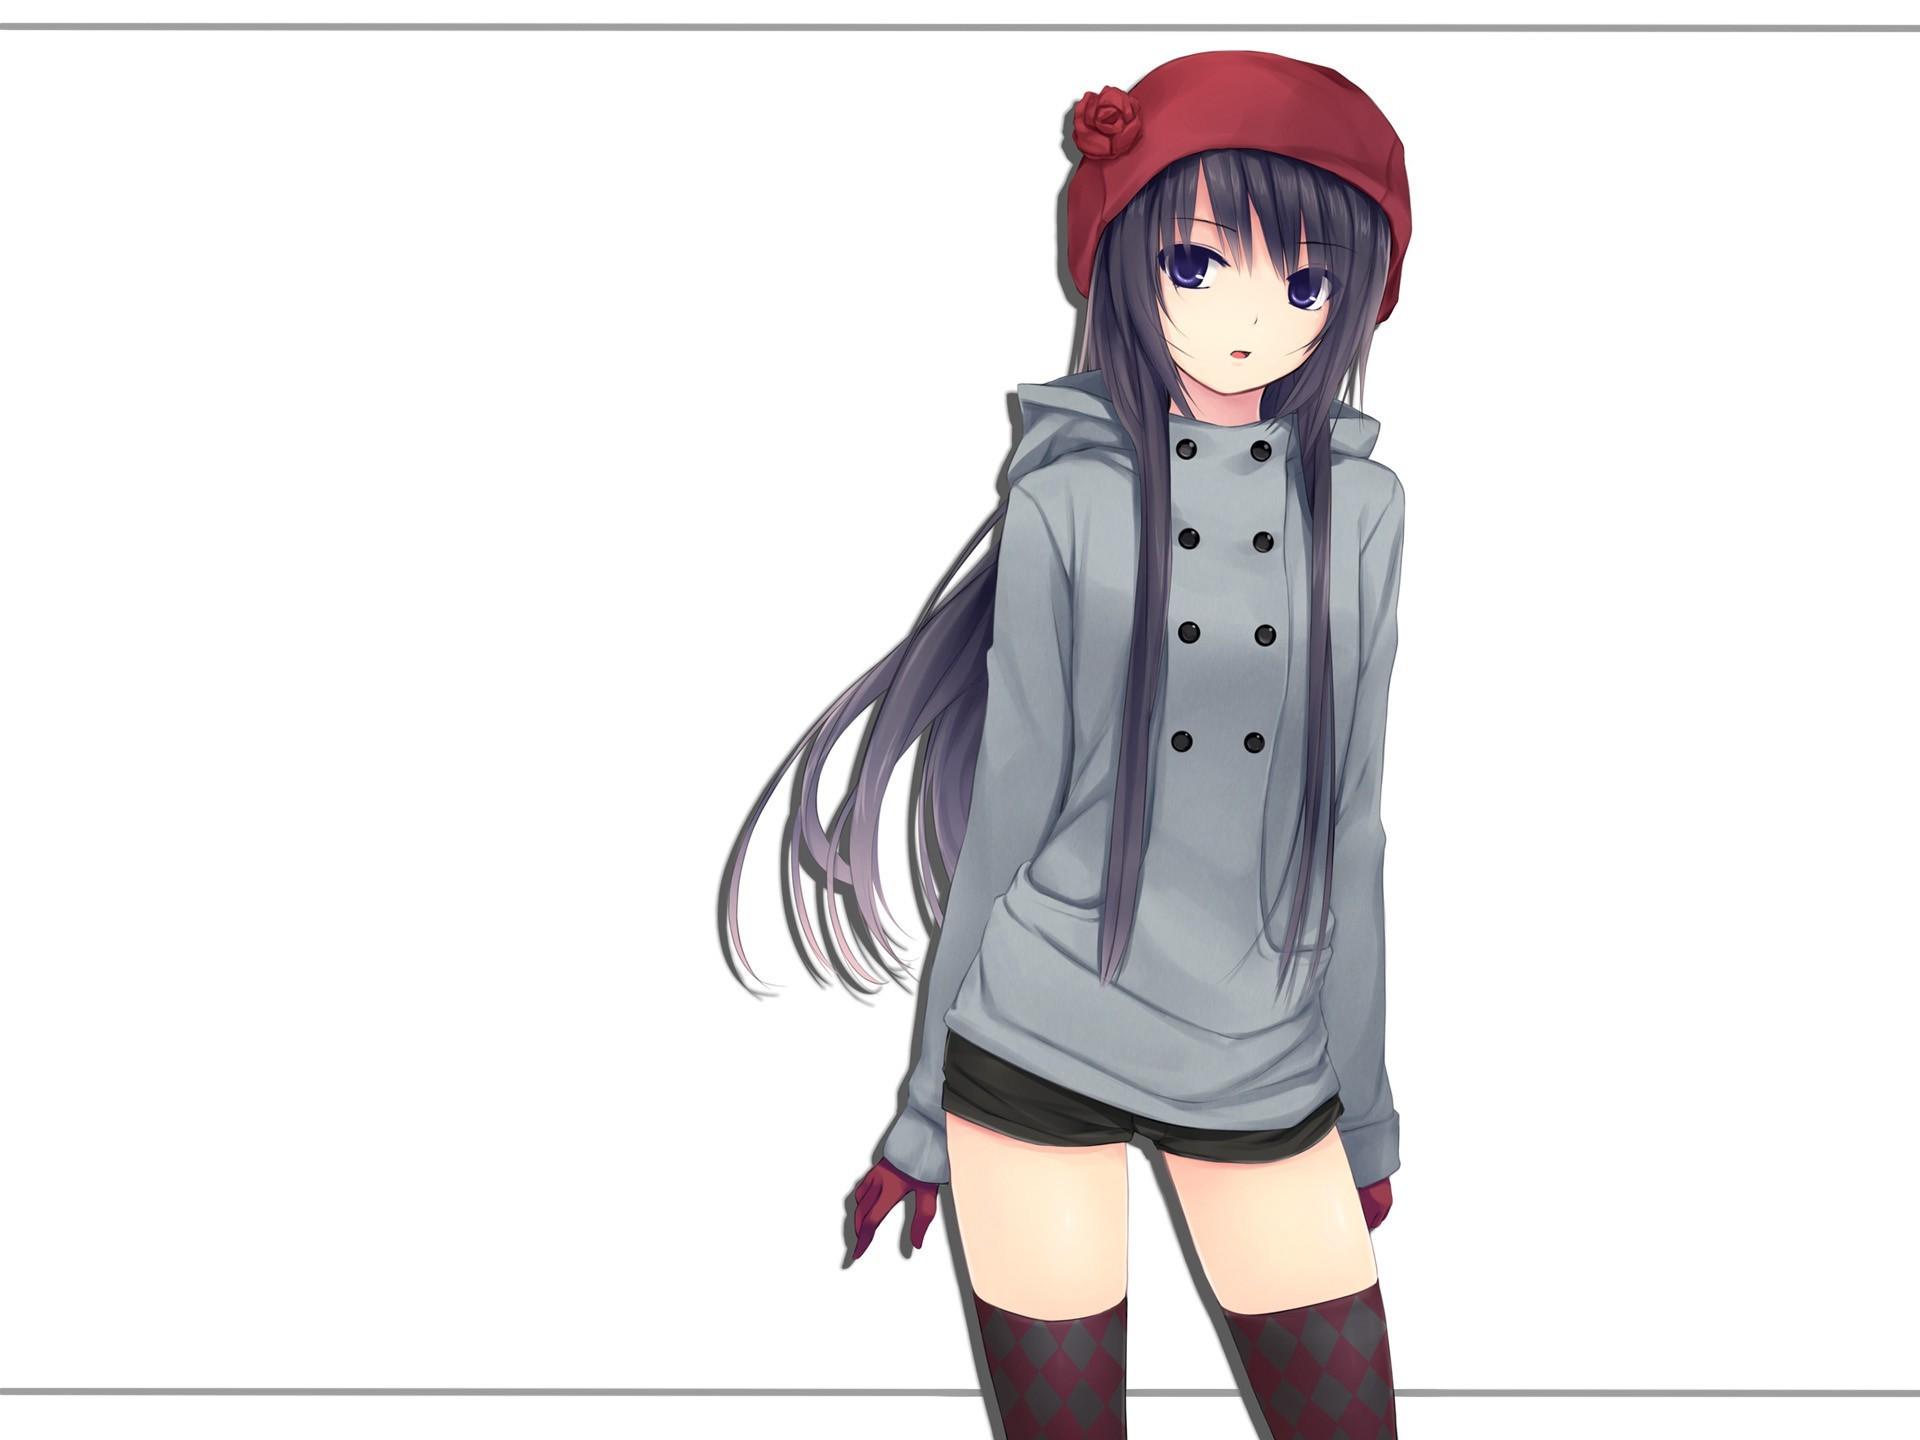 Fondos De Pantalla : Anime, Chicas Anime, Dibujos Animados